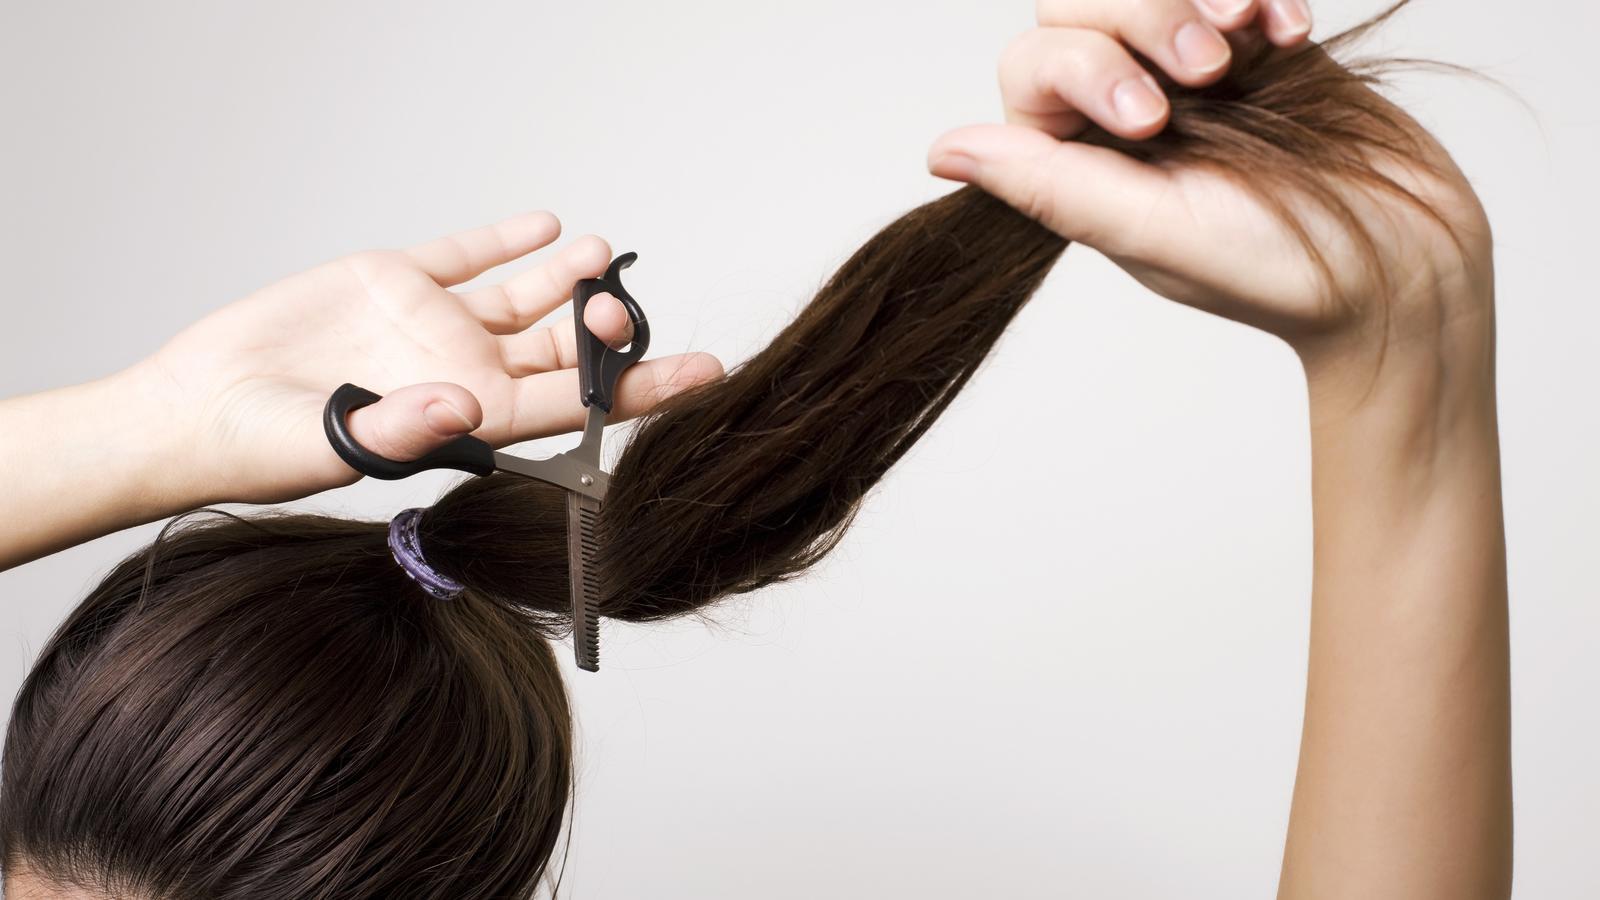 kurze haare selber stufig schneiden anleitung